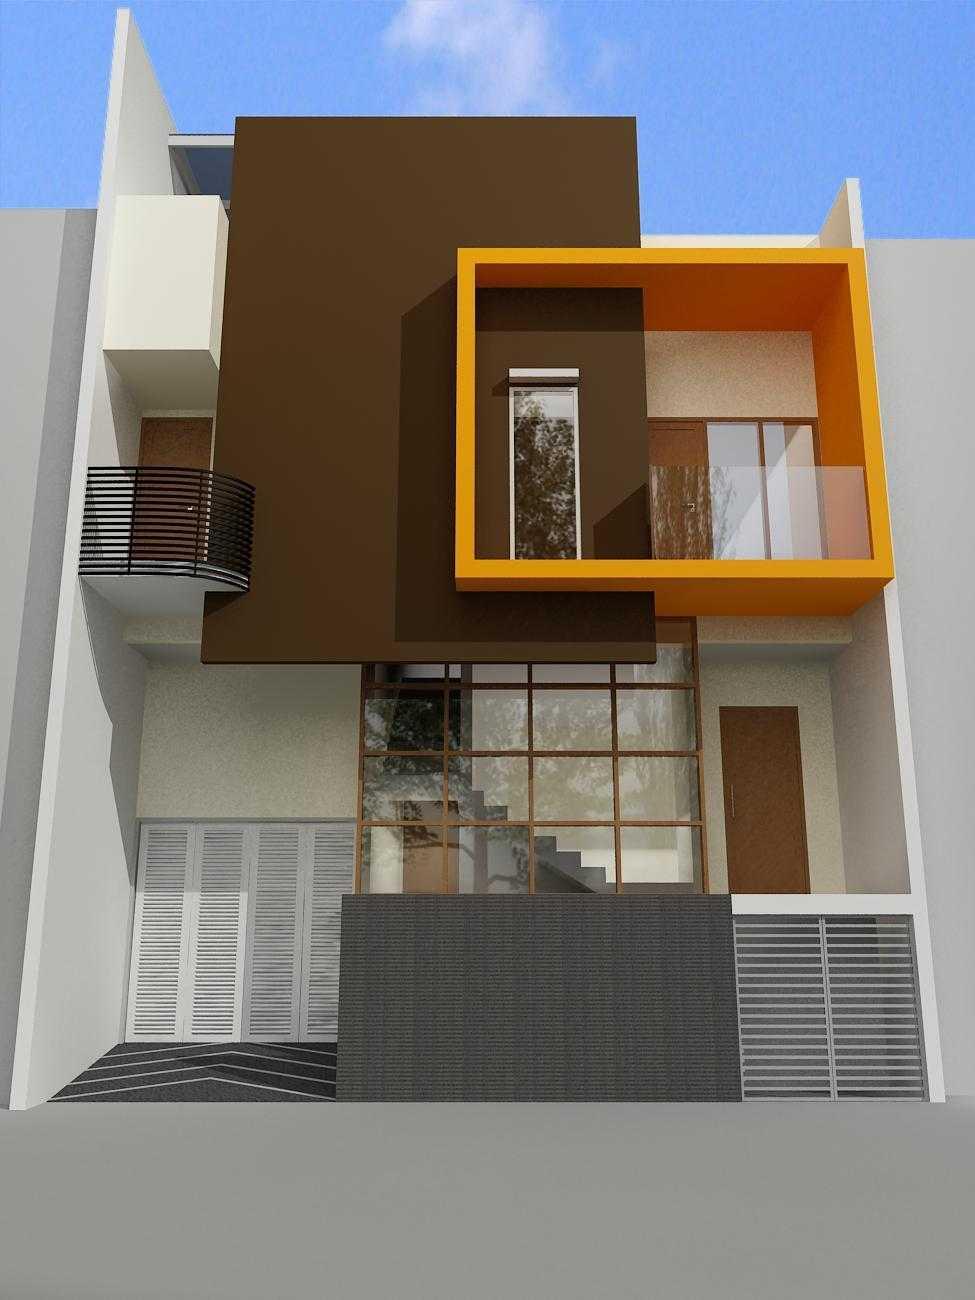 Ir. Susanto Sjamsuddin Box House Tomang, Grogol Petamburan, West Jakarta City, Jakarta, Indonesia Tomang, Grogol Petamburan, West Jakarta City, Jakarta, Indonesia Img1240 Minimalis  35385